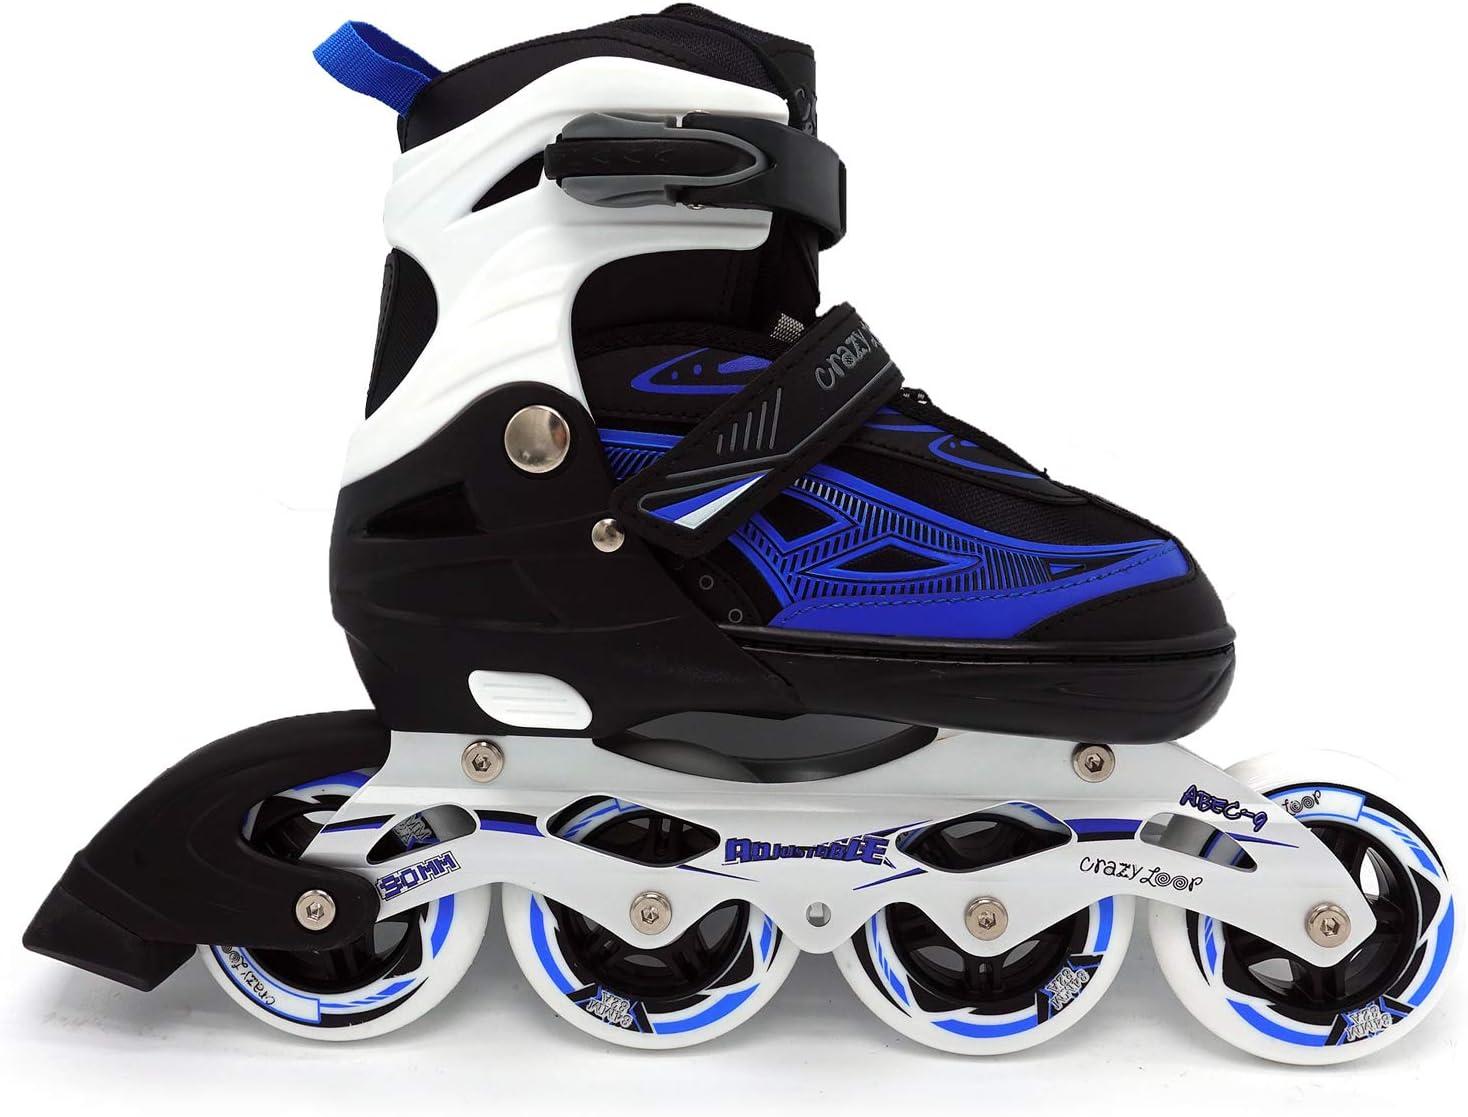 Blue Child Adolescent Adults Rollerblades Sizes Adjustable Women Inline Skates , Three Big Wheels